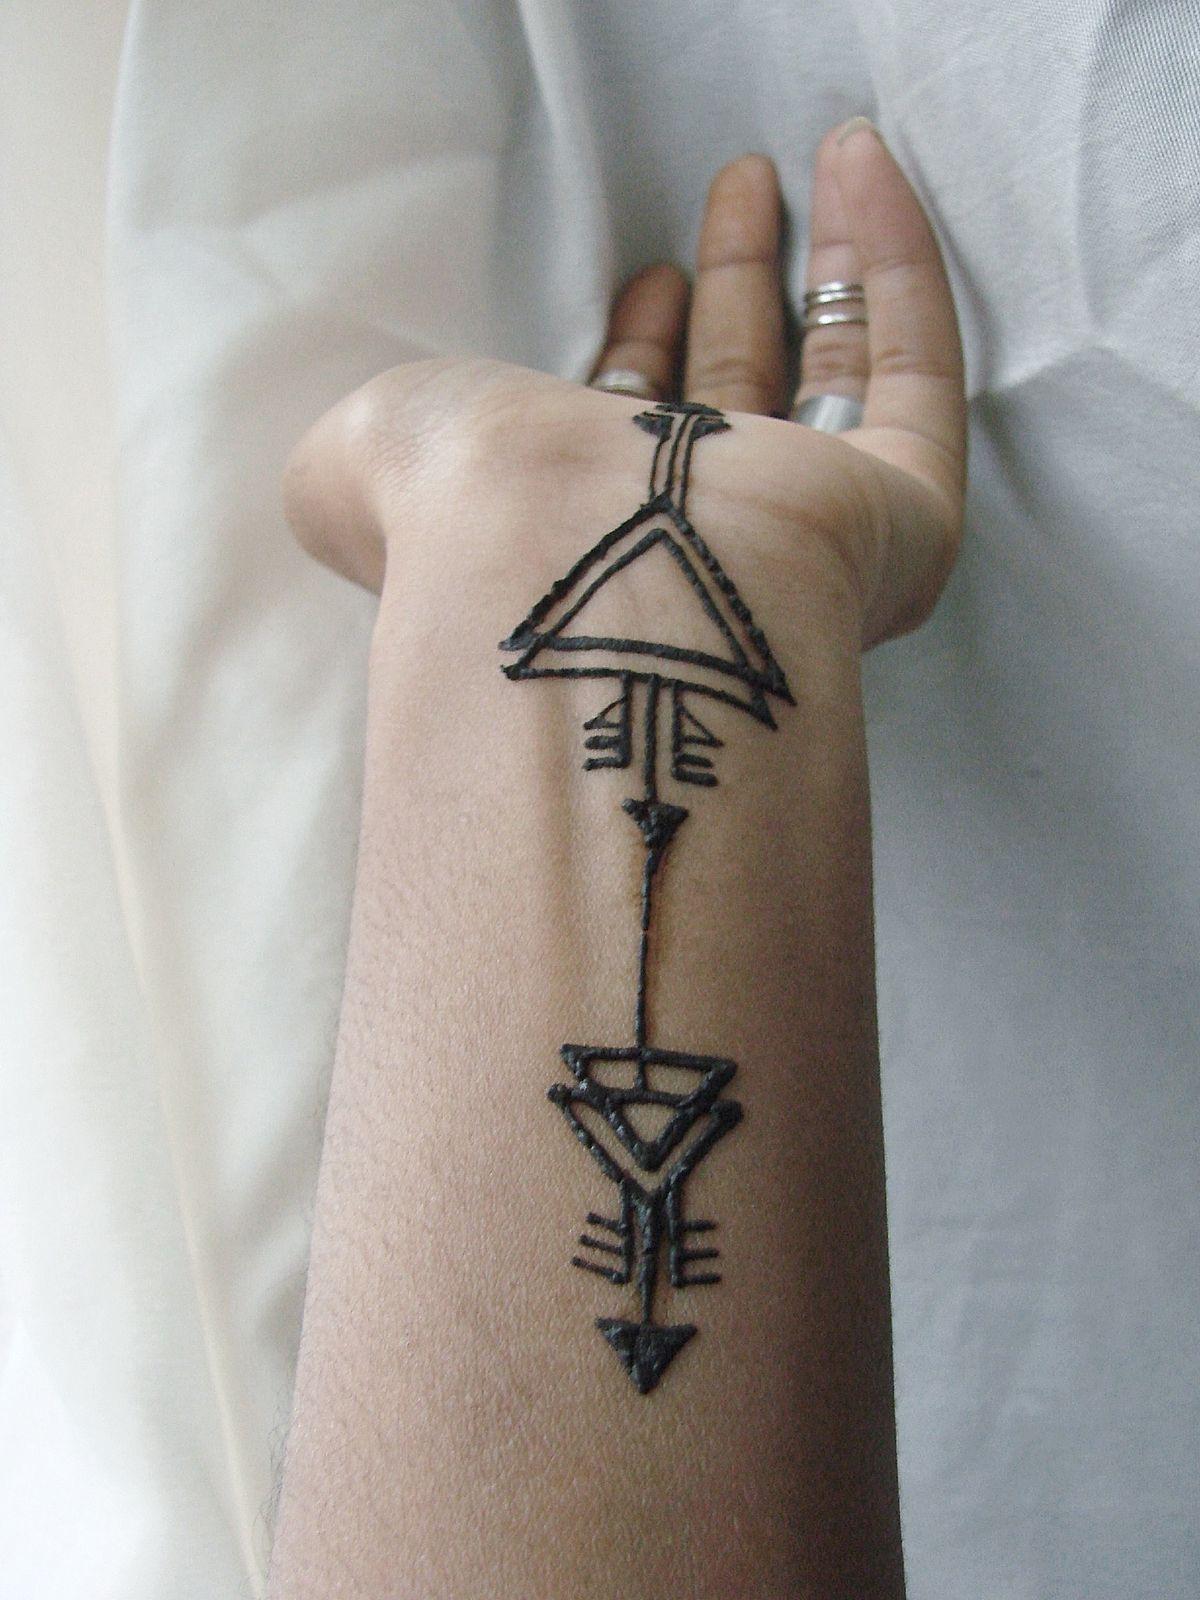 Pin By Casey Boksha On Tattoos Henna Henna Tattoo Designs Henna Ink